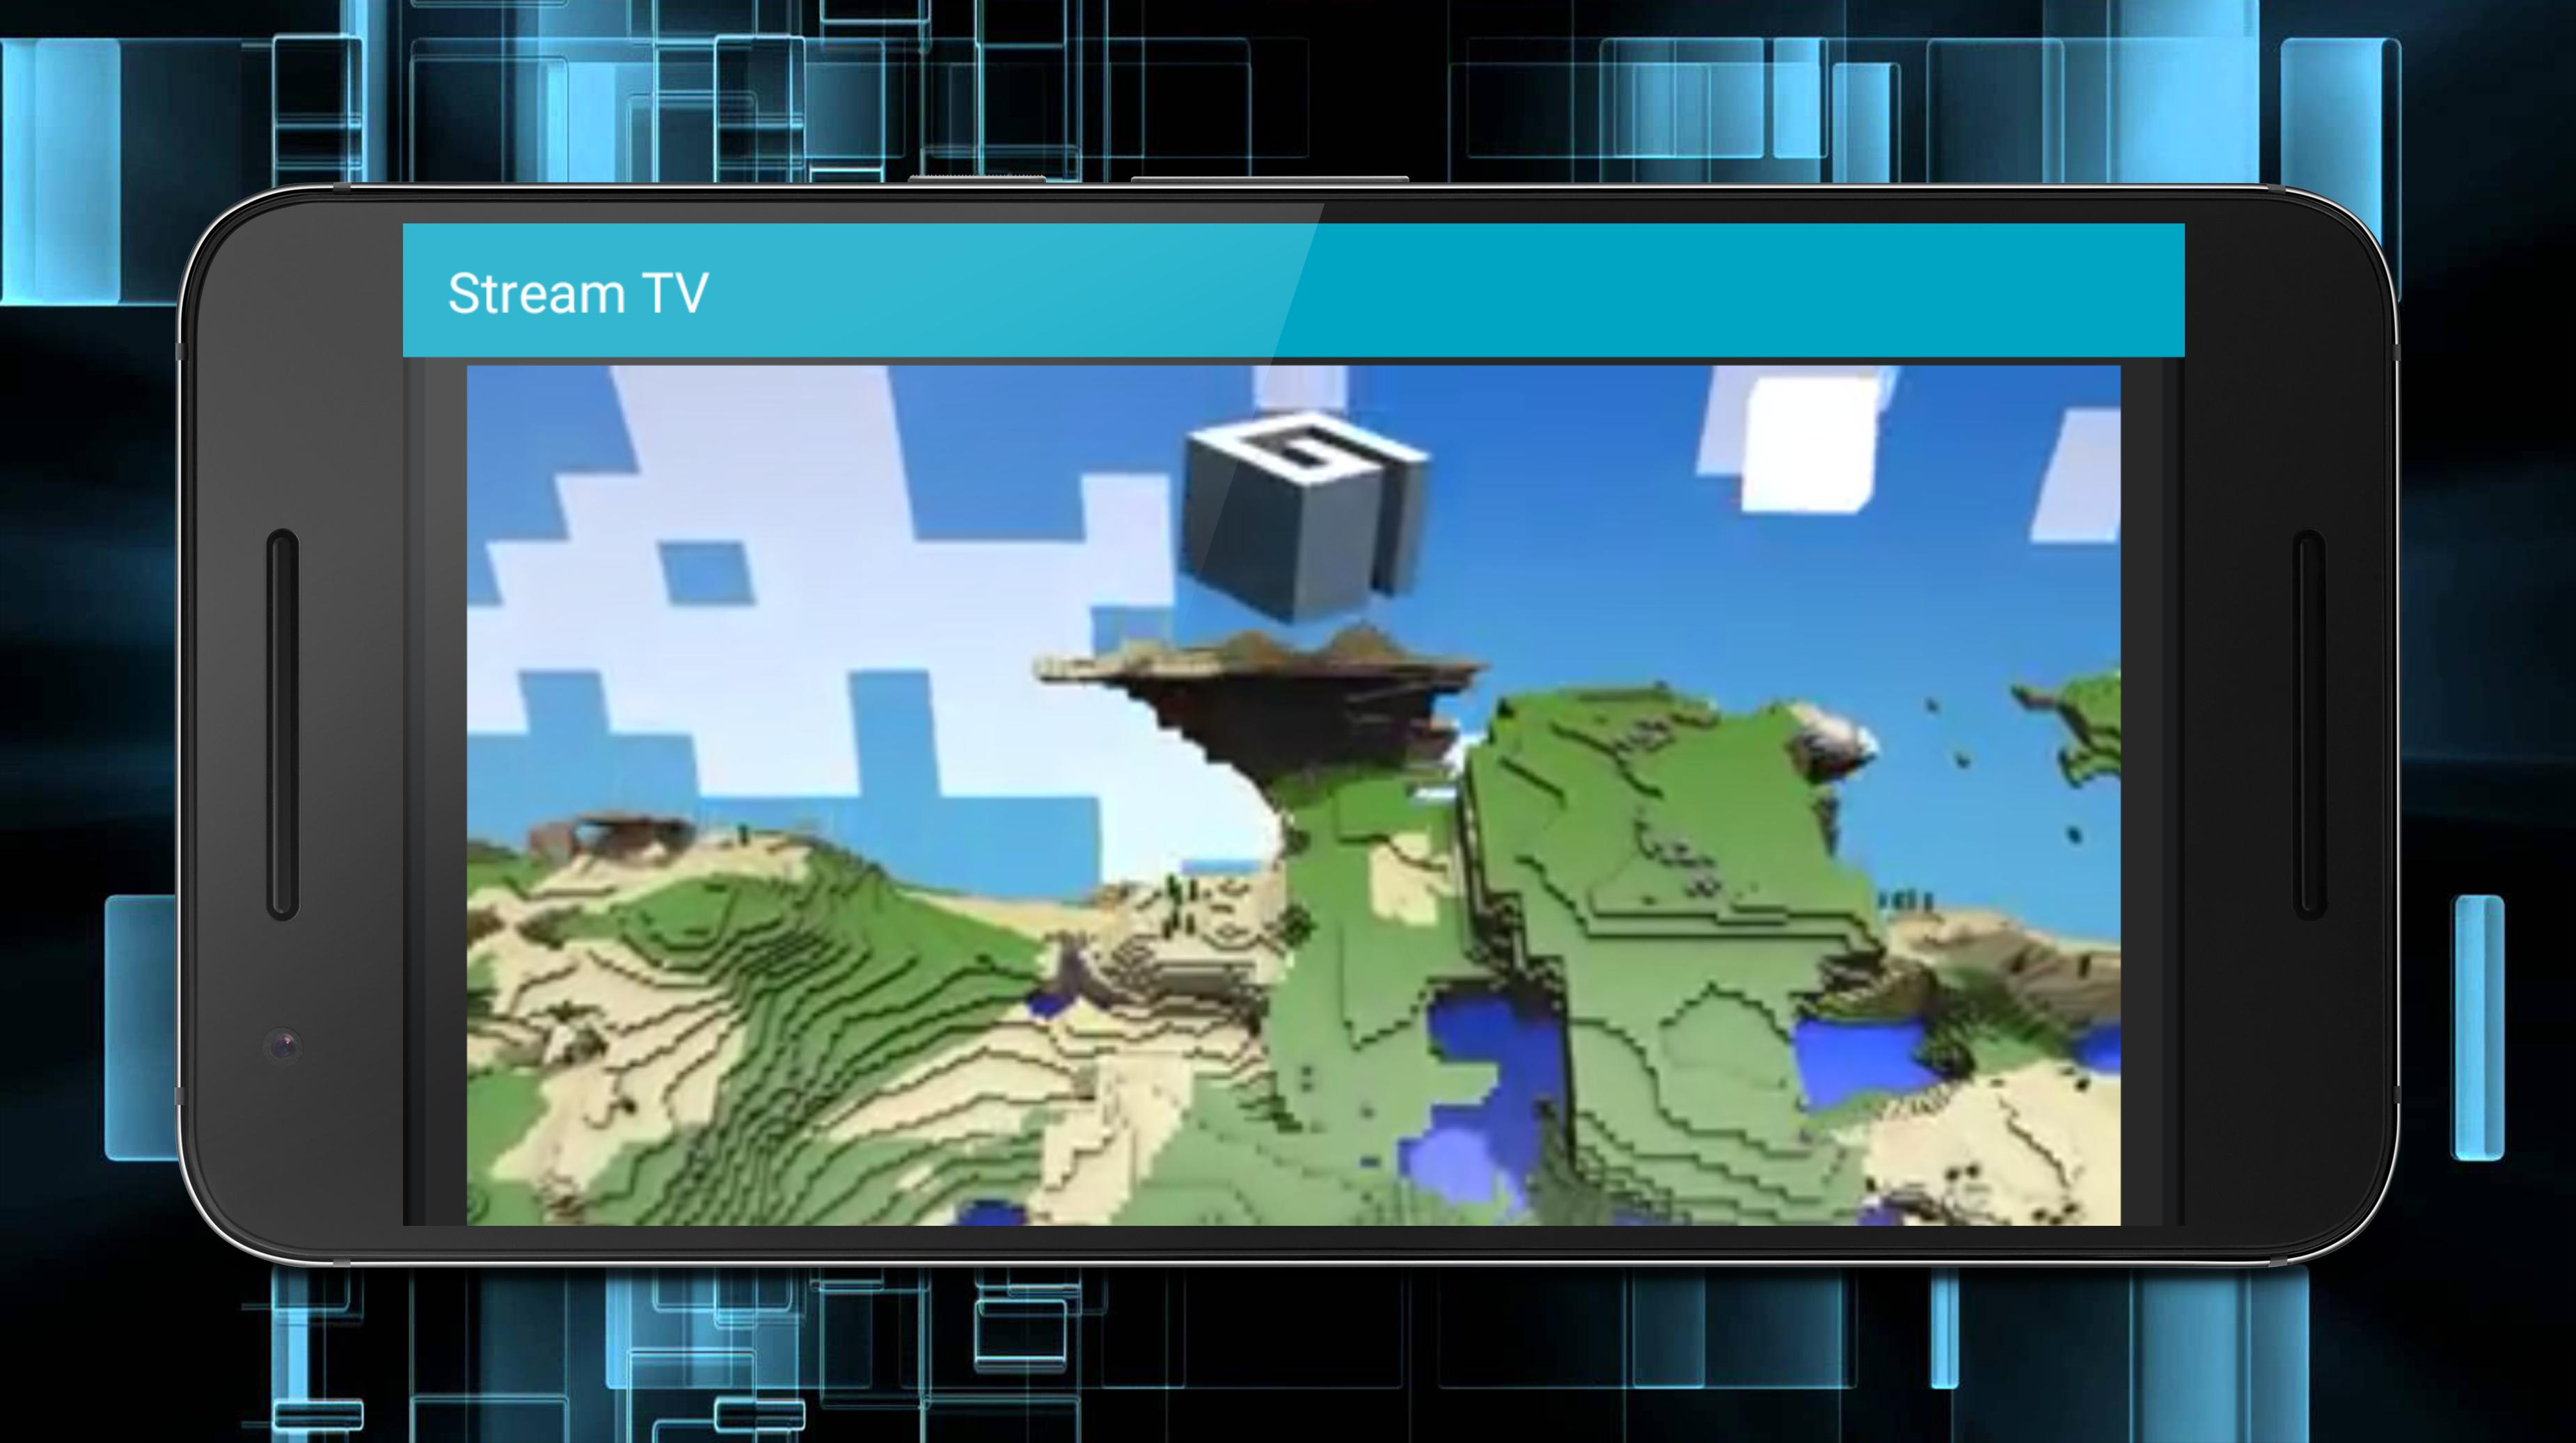 Streamtv.Tv